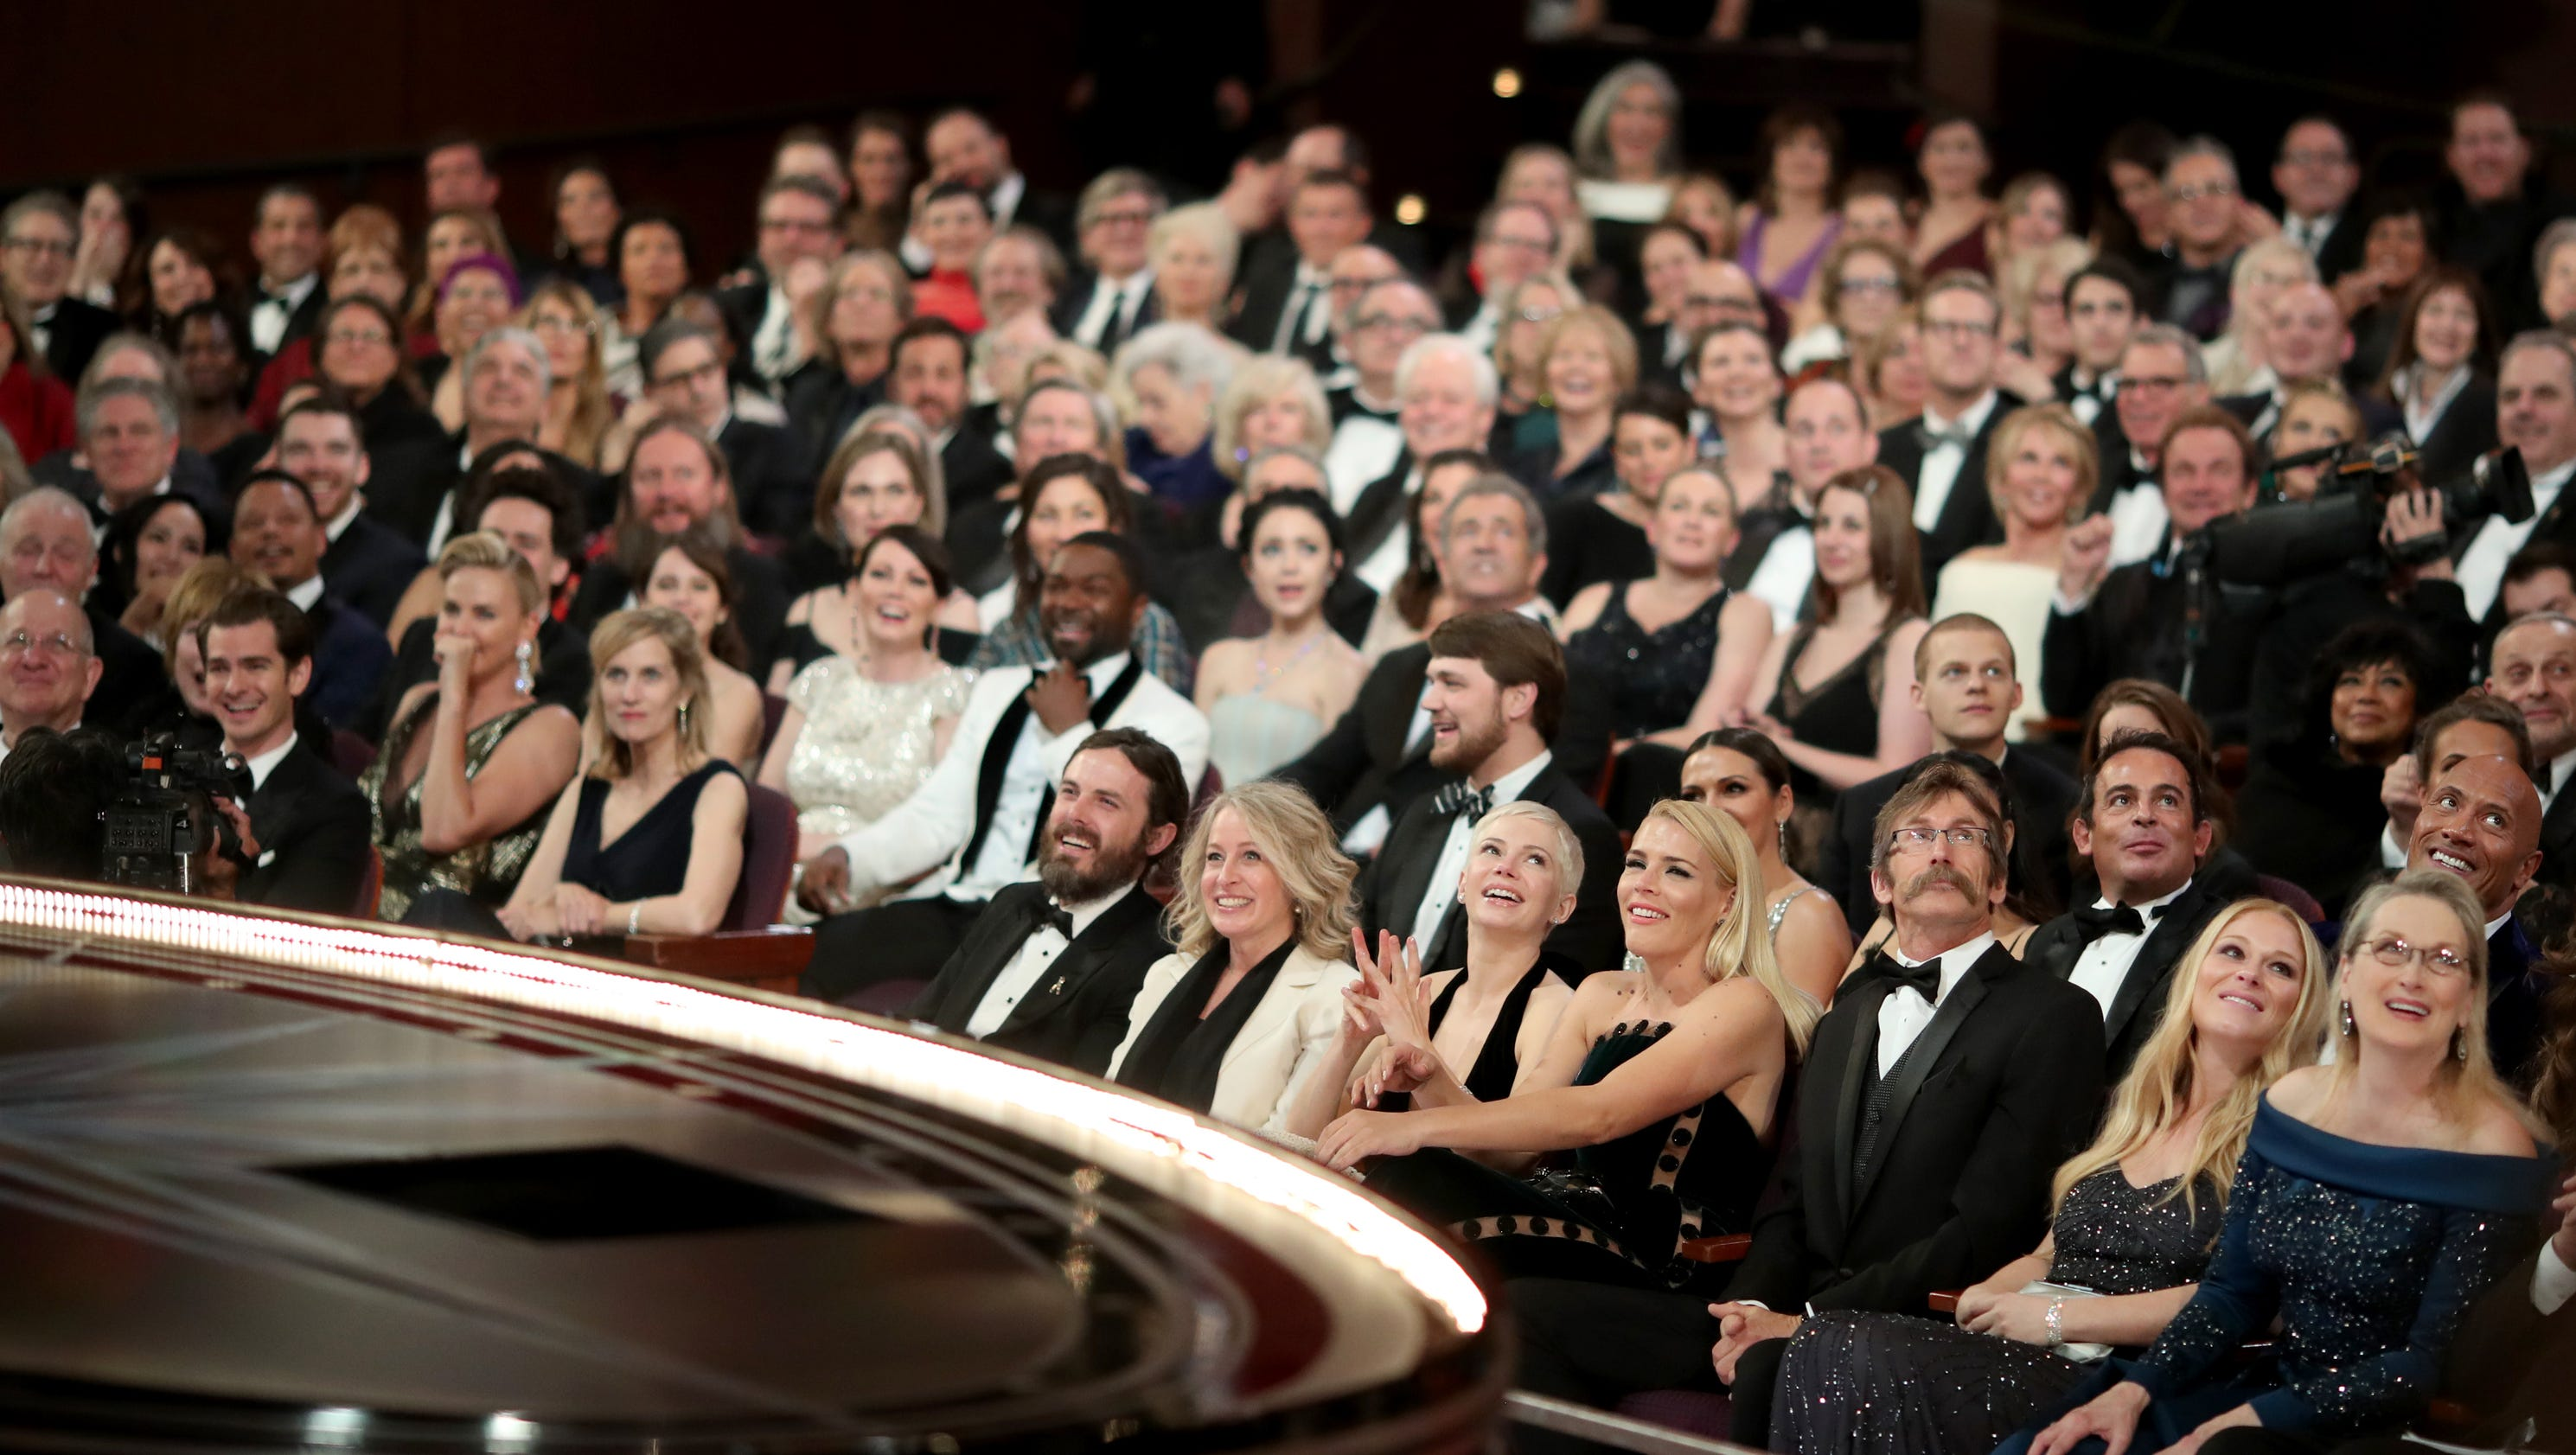 Emma Stone Wins Oscar Best Actress Academy Award 1201787408 besides Dunkirk furthermore 16631518675 additionally Sunrise Coigney Mark Ruffalos Wife in addition 98474792. on academy award nominations